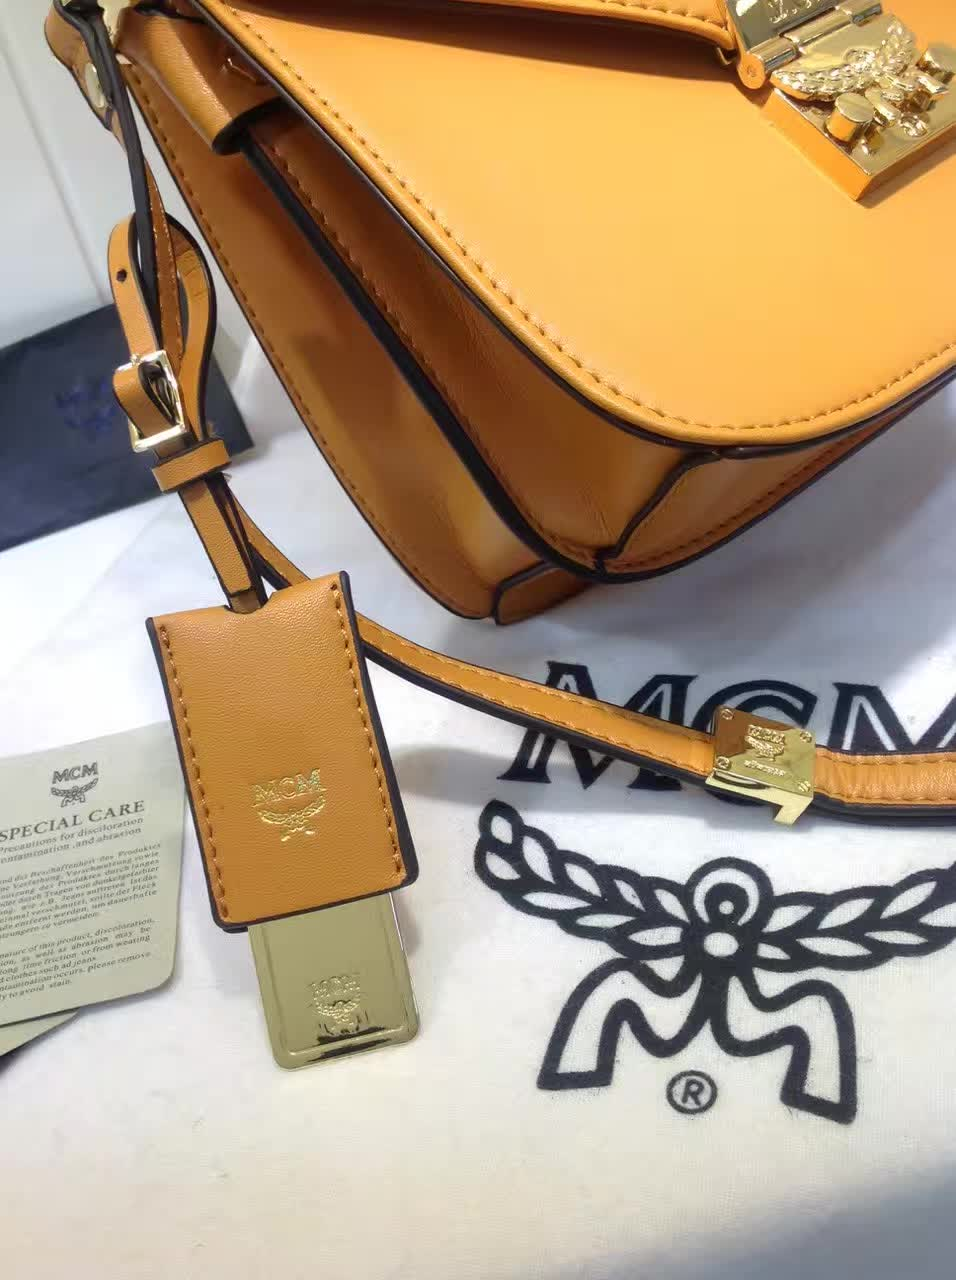 MCM官网 Patricia系列邮差包 外观简约时尚 翻绒内里 实用多隔层 土黄